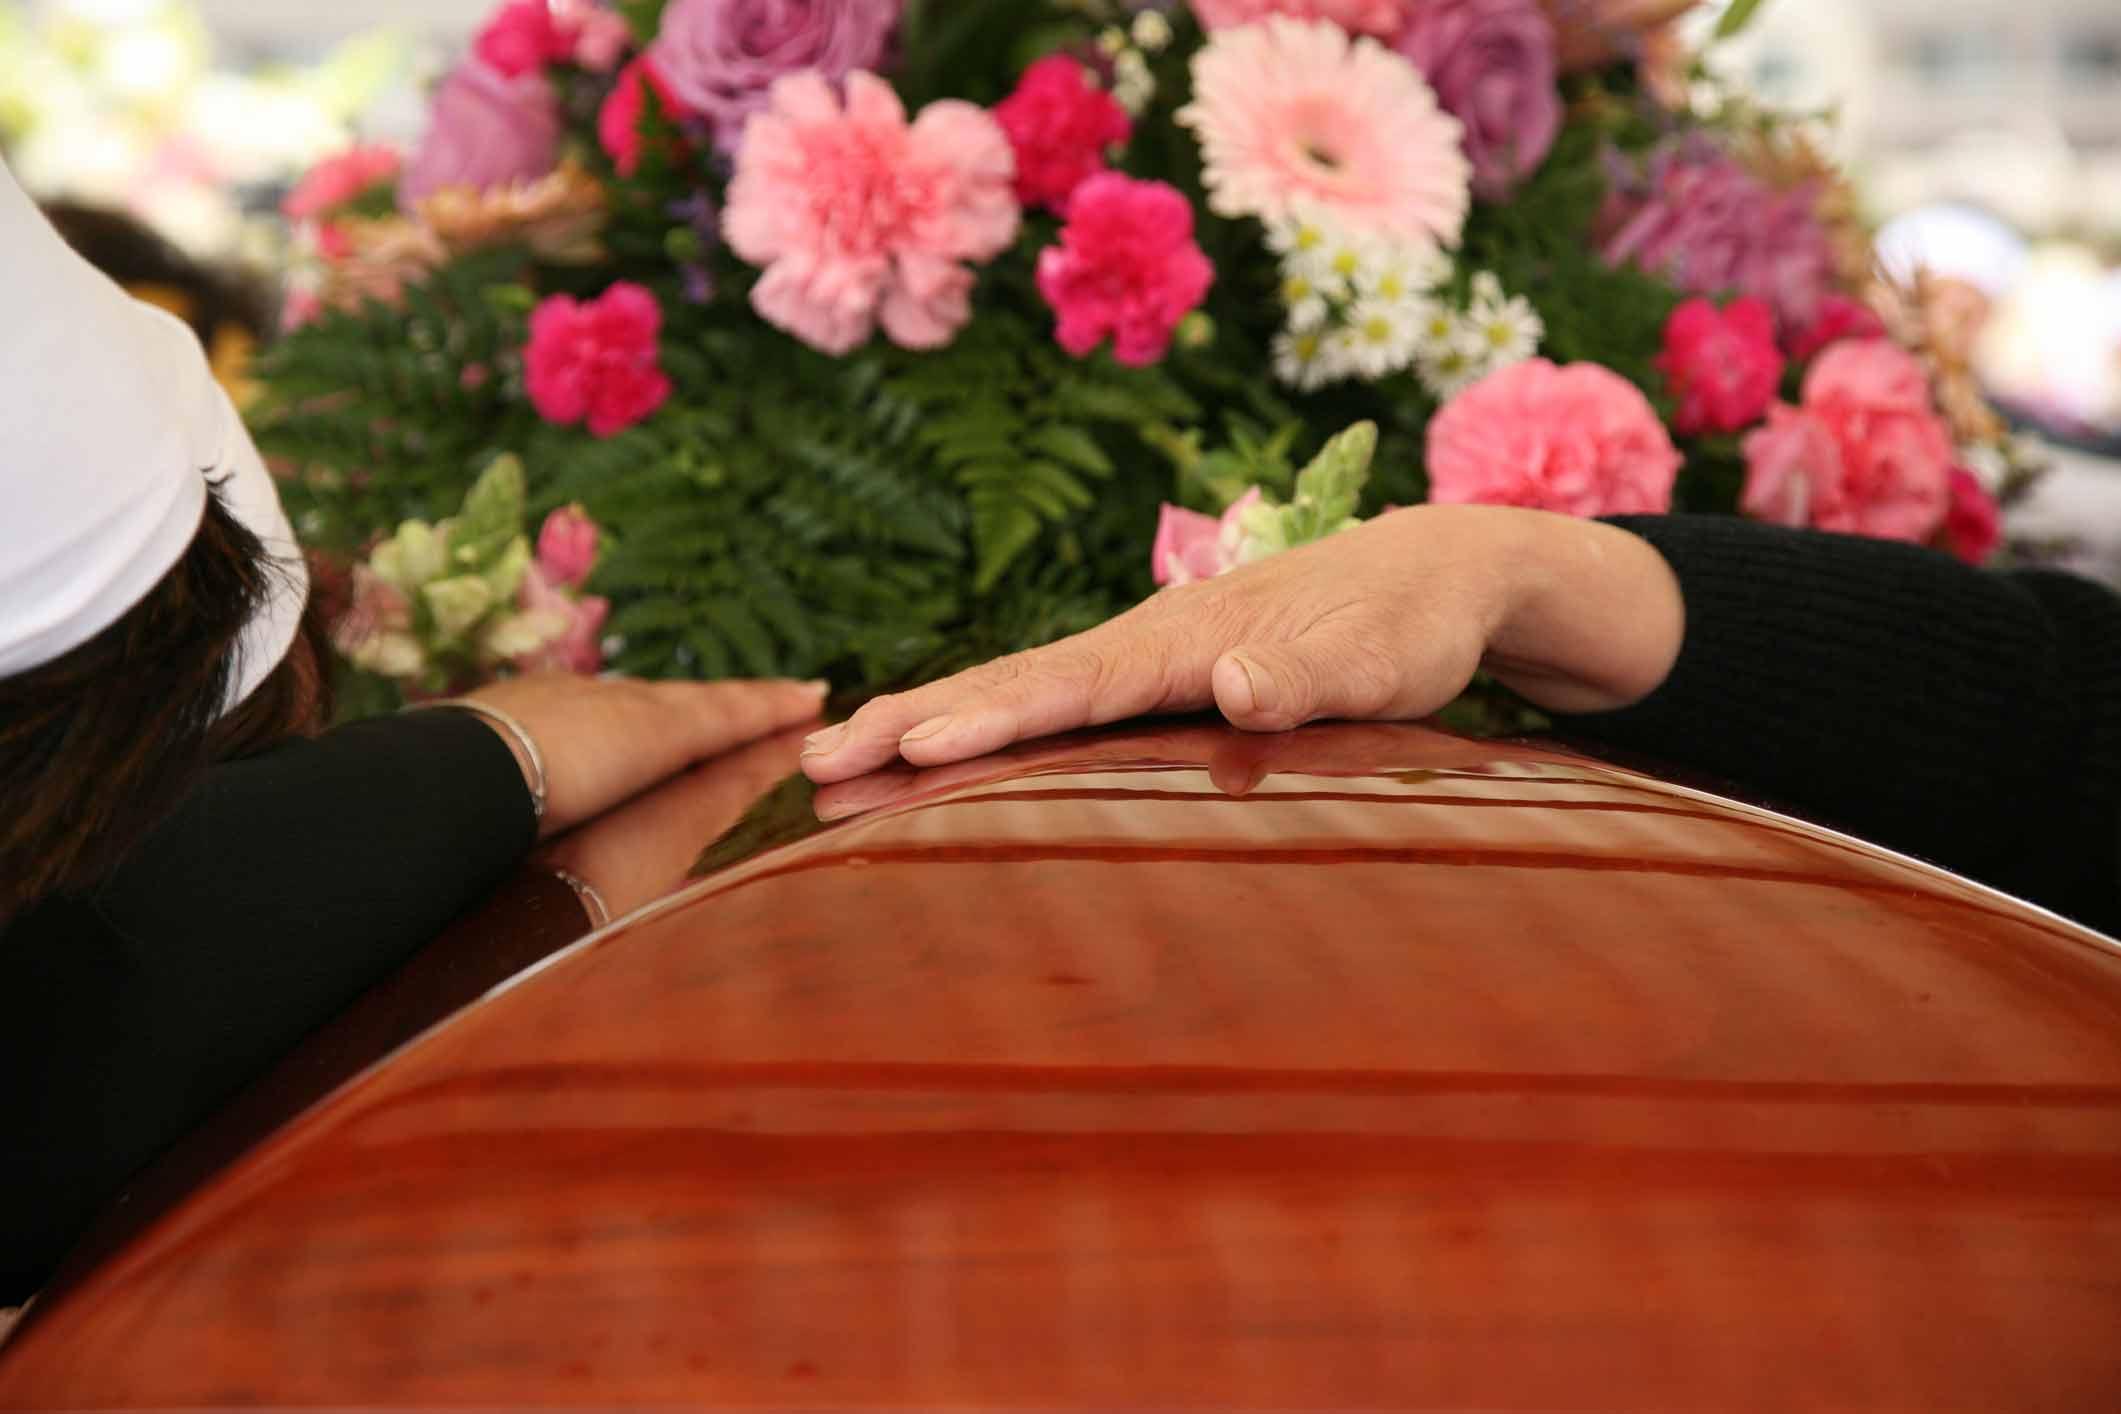 hands-on-casket